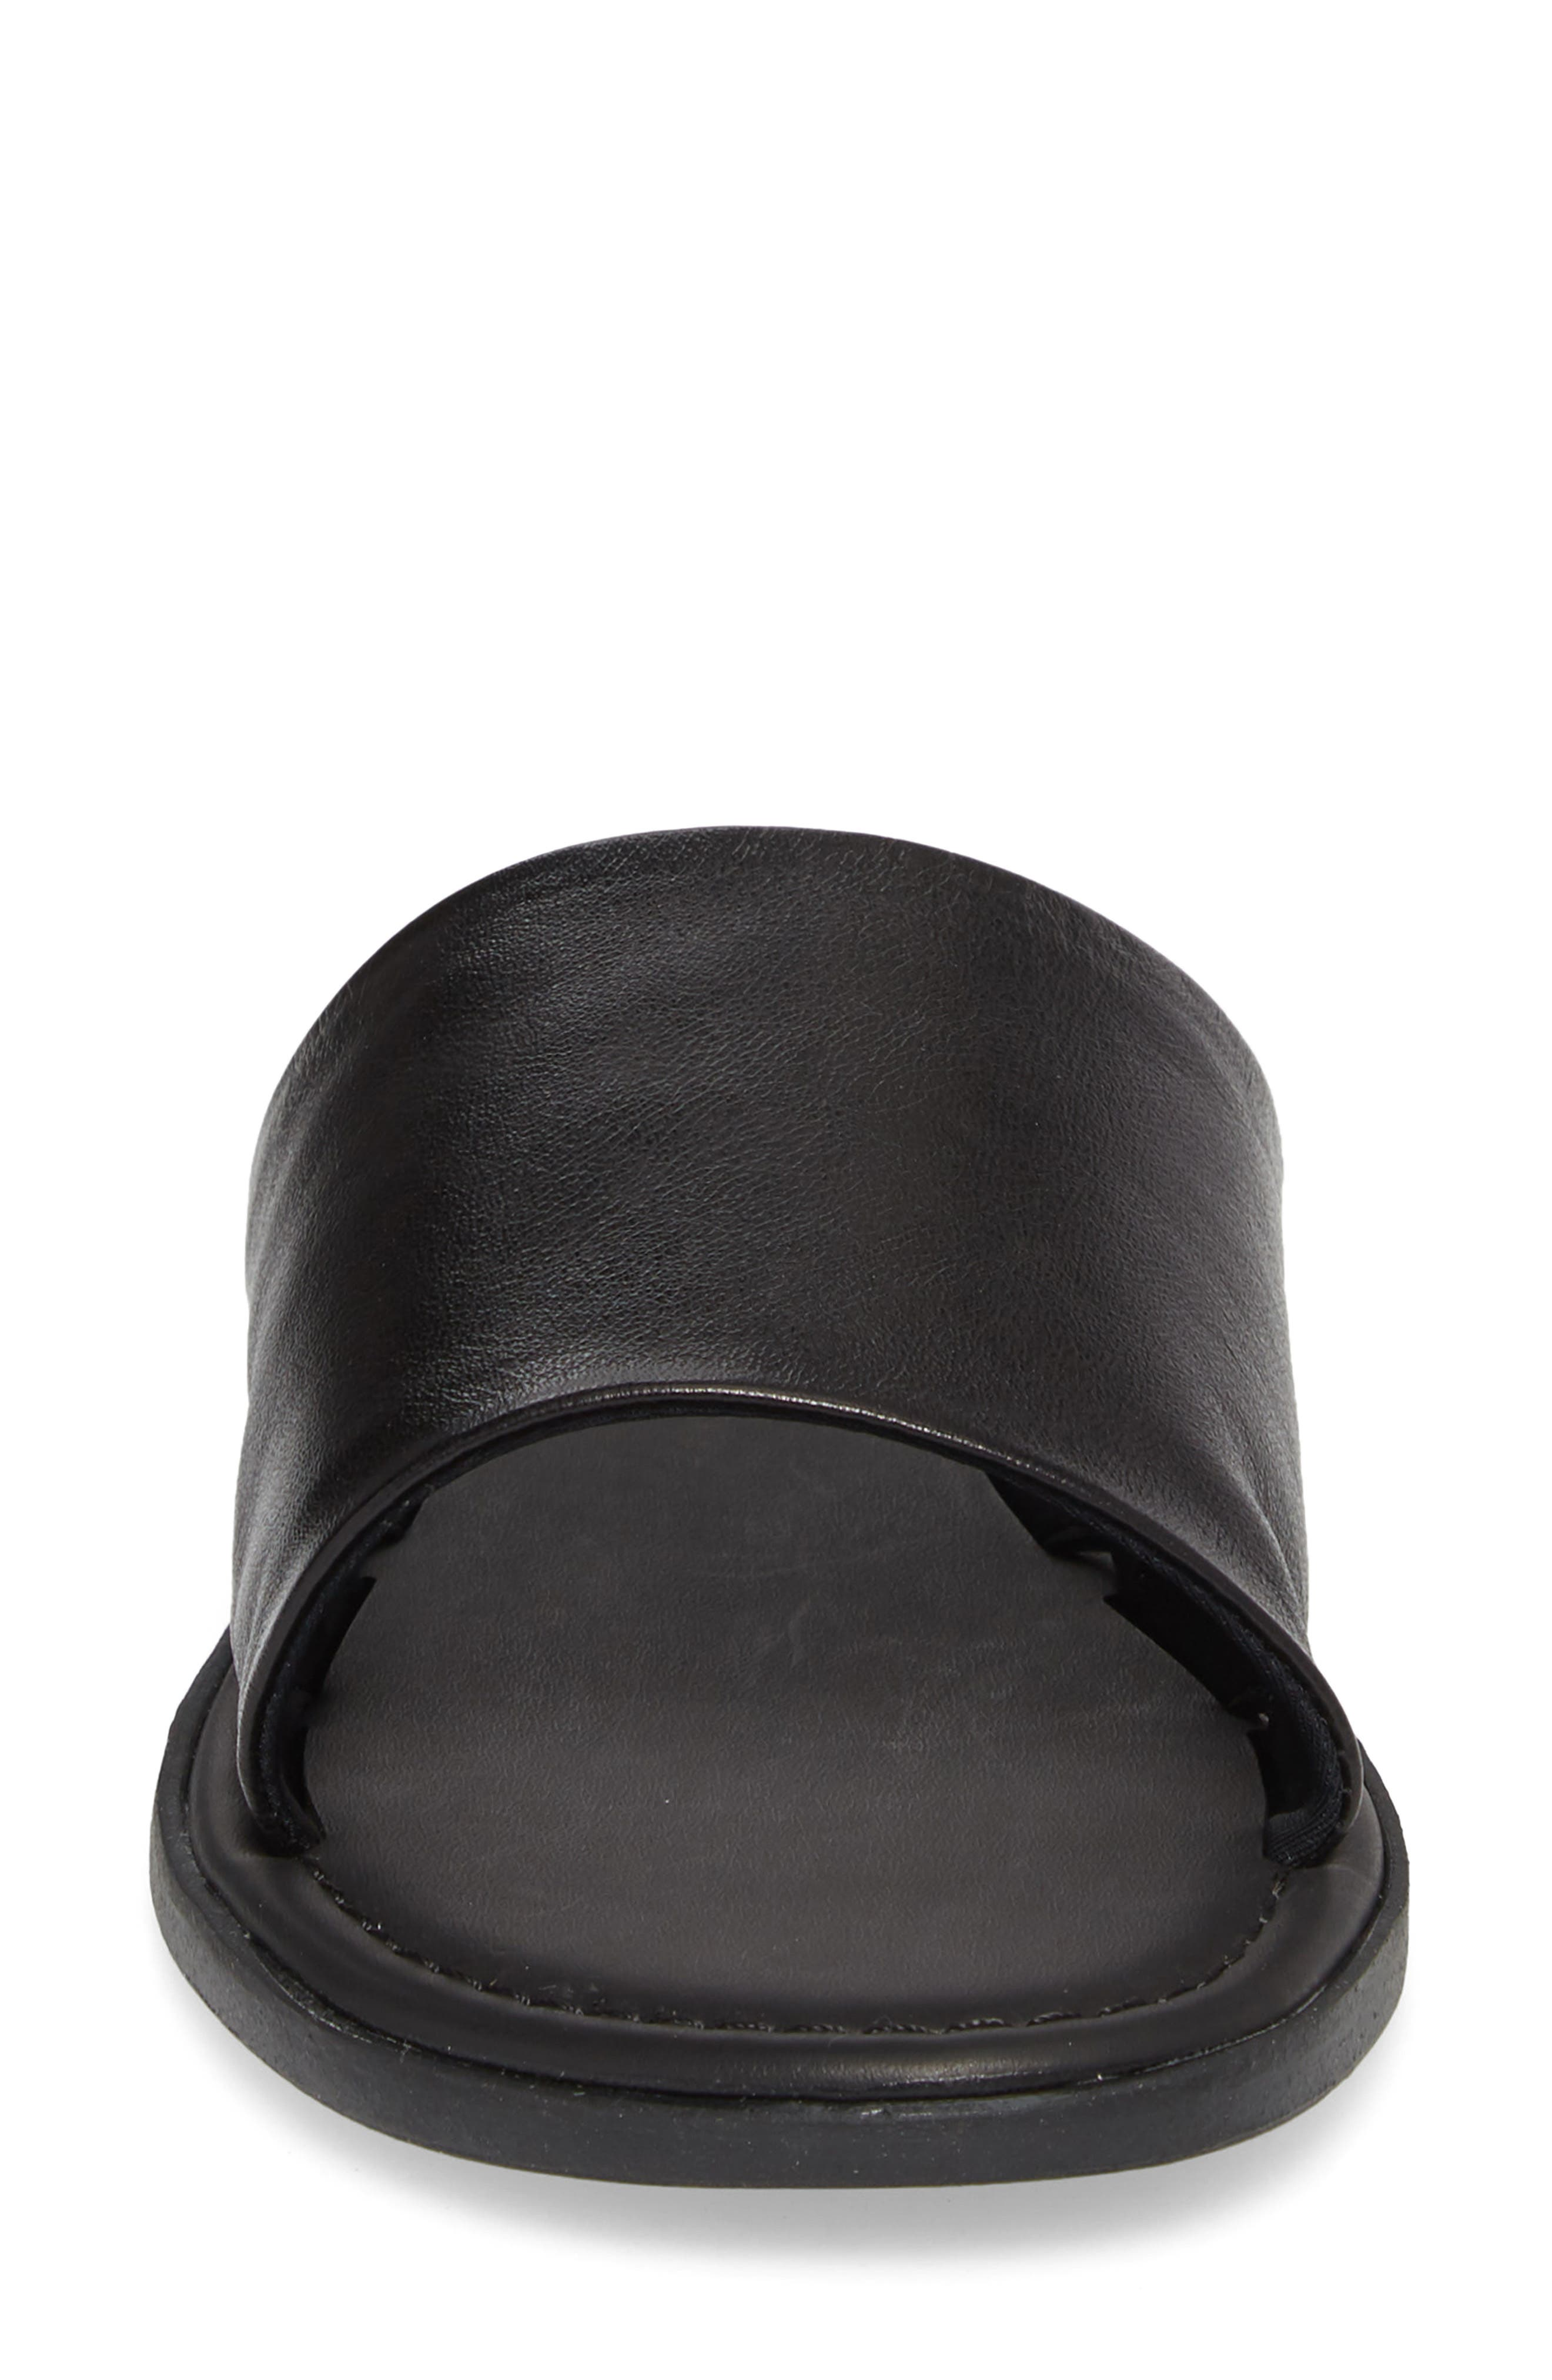 Camilla Slide Sandal,                             Alternate thumbnail 4, color,                             Black Leather